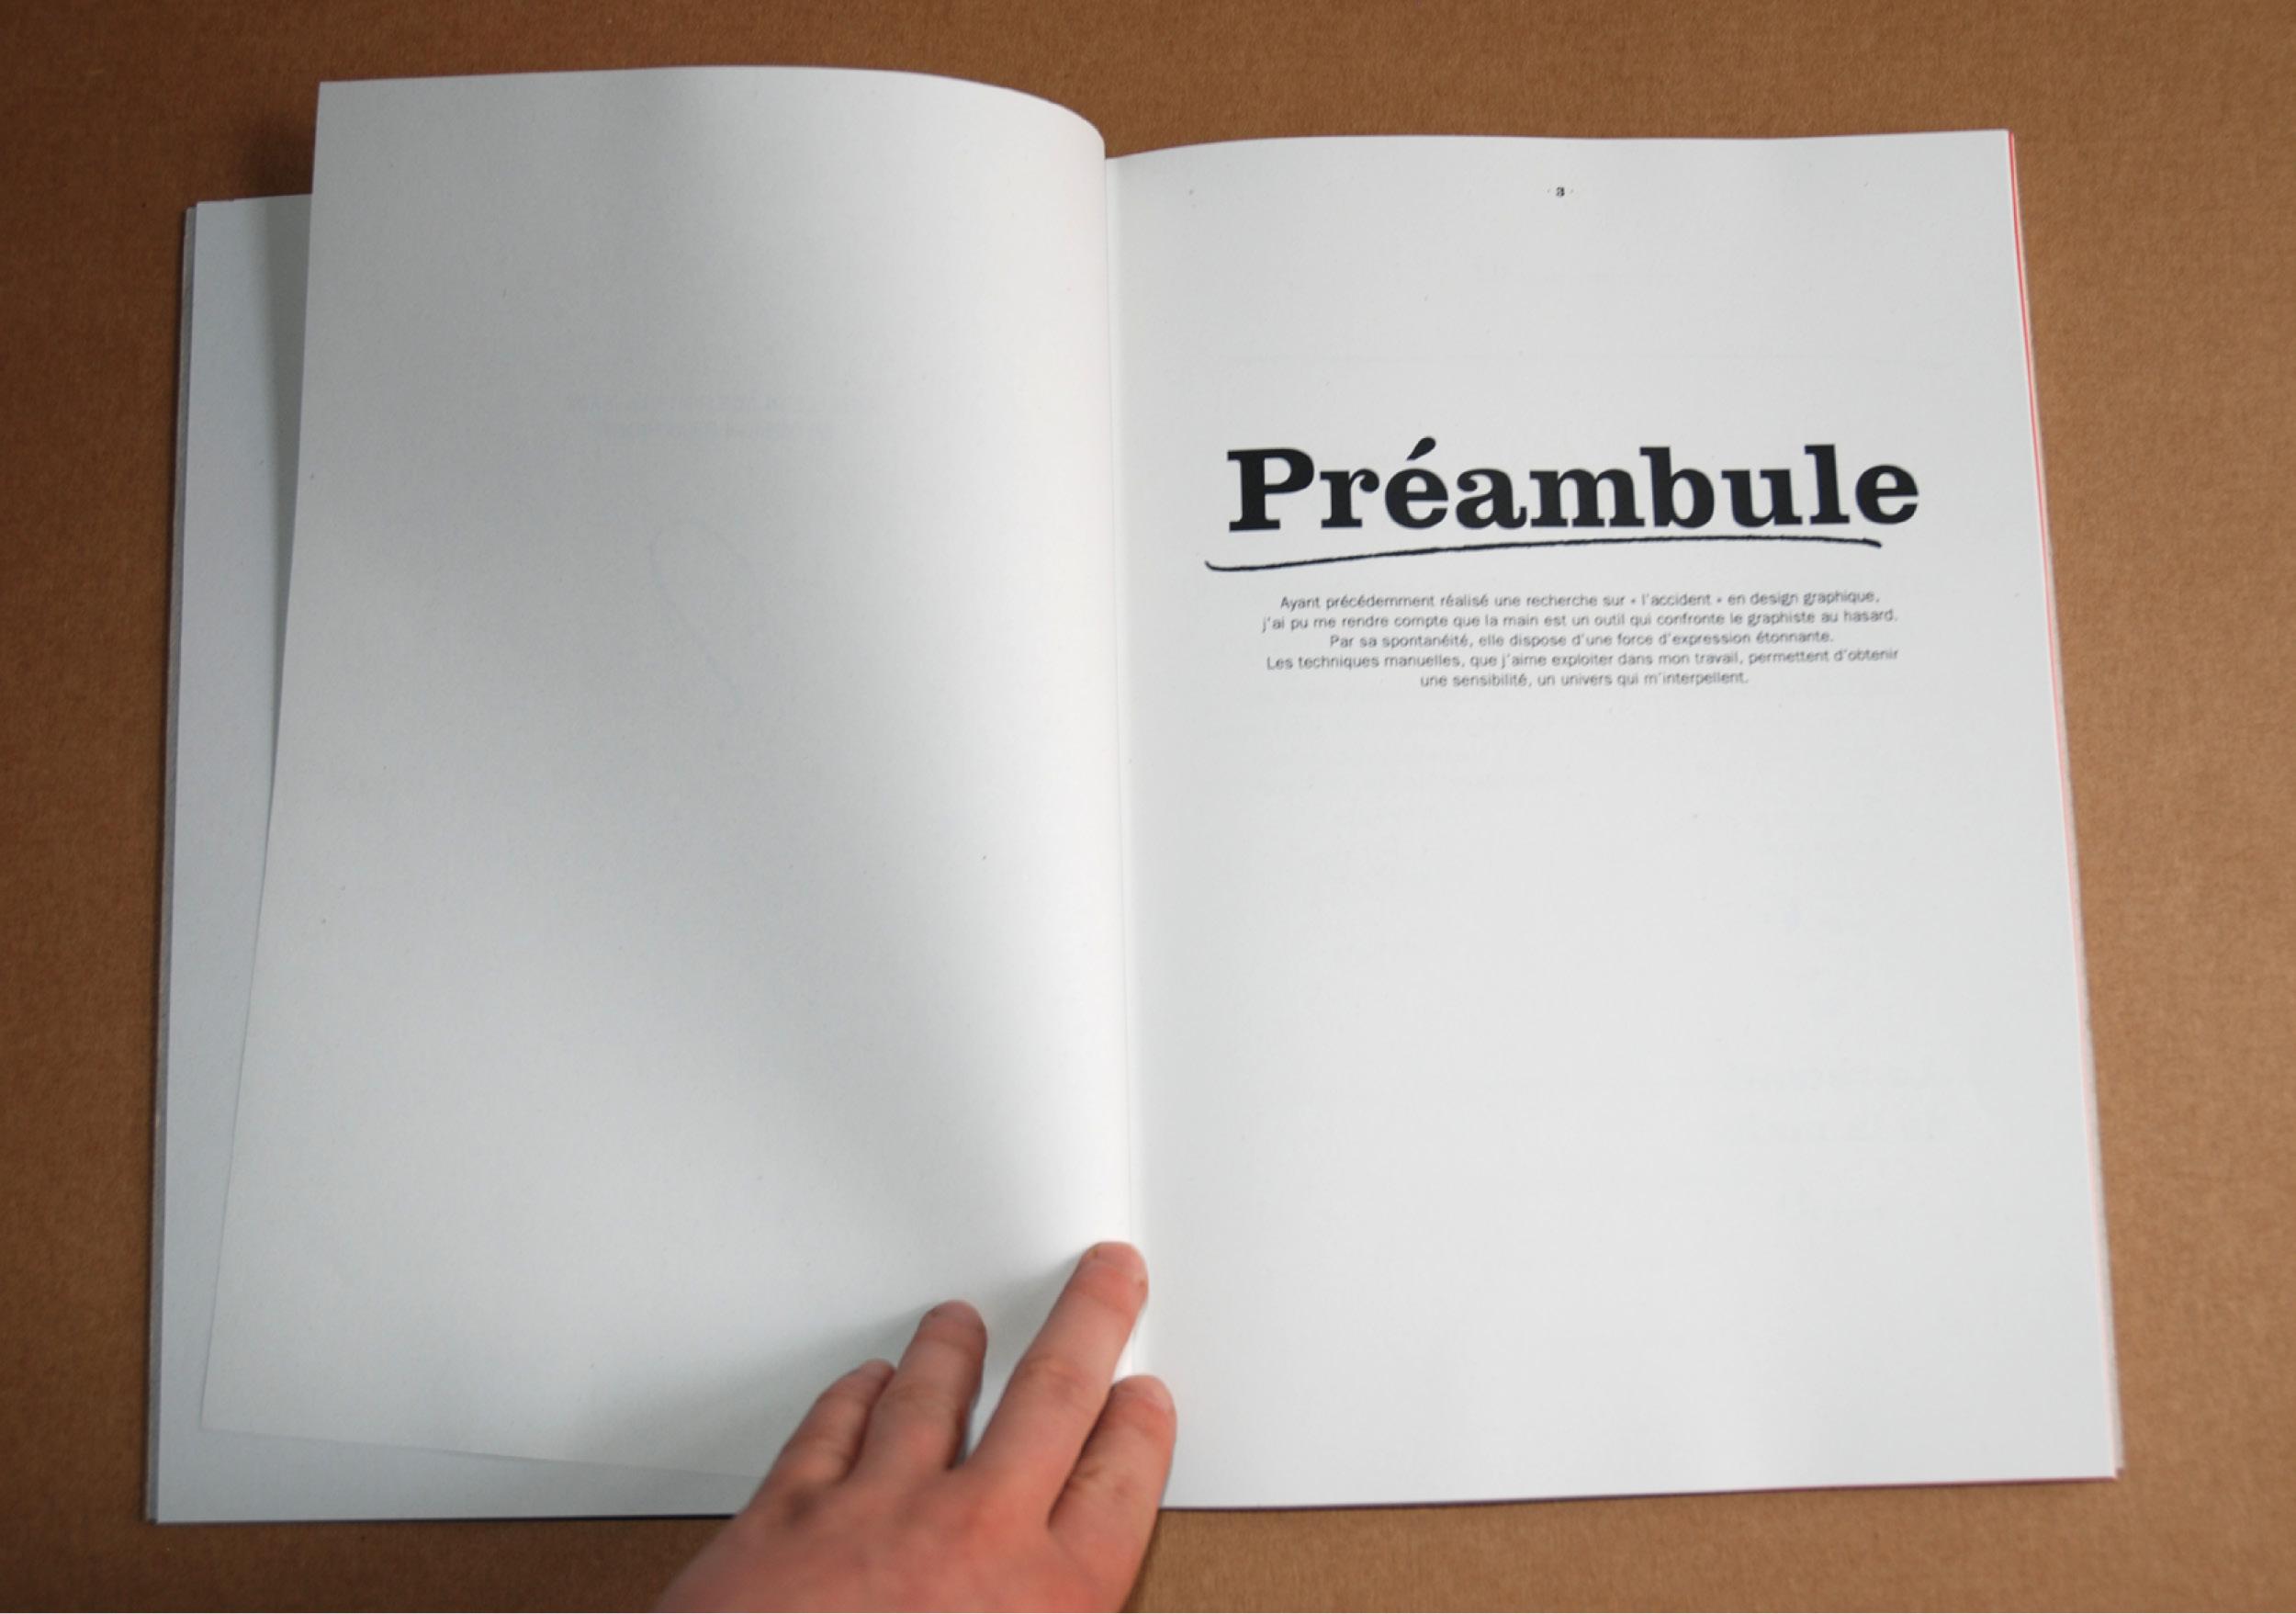 Edition livre typographique manuscrite fait-main design graphique